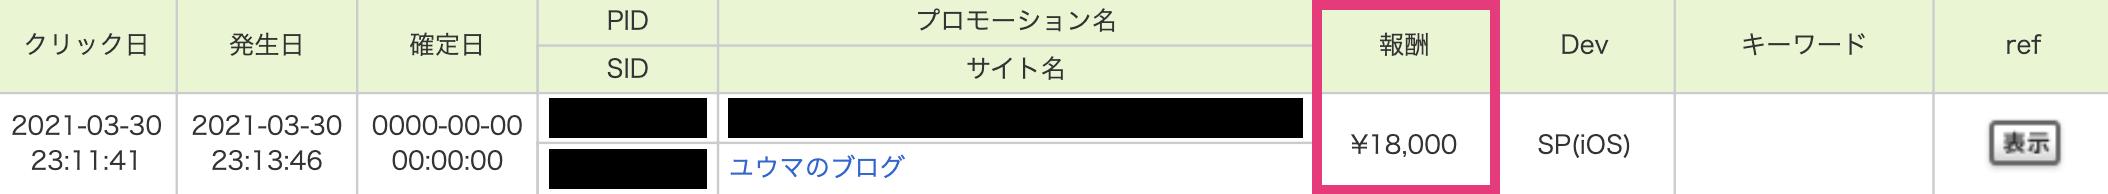 1万8千円の成果発生